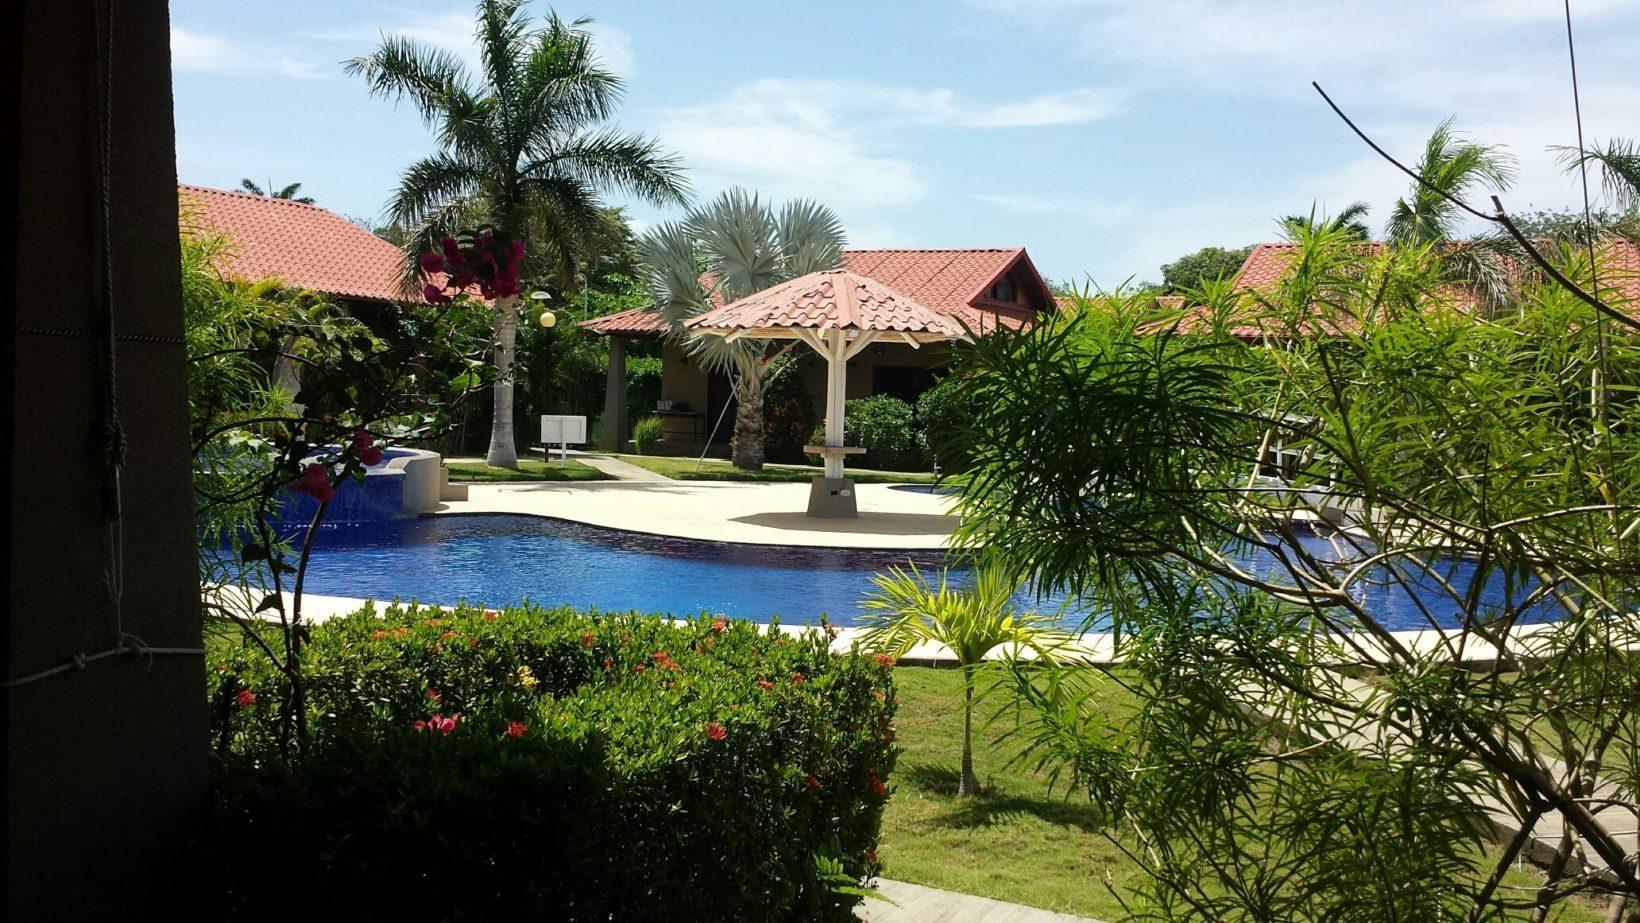 Residence4-20150704_103915_resized_1